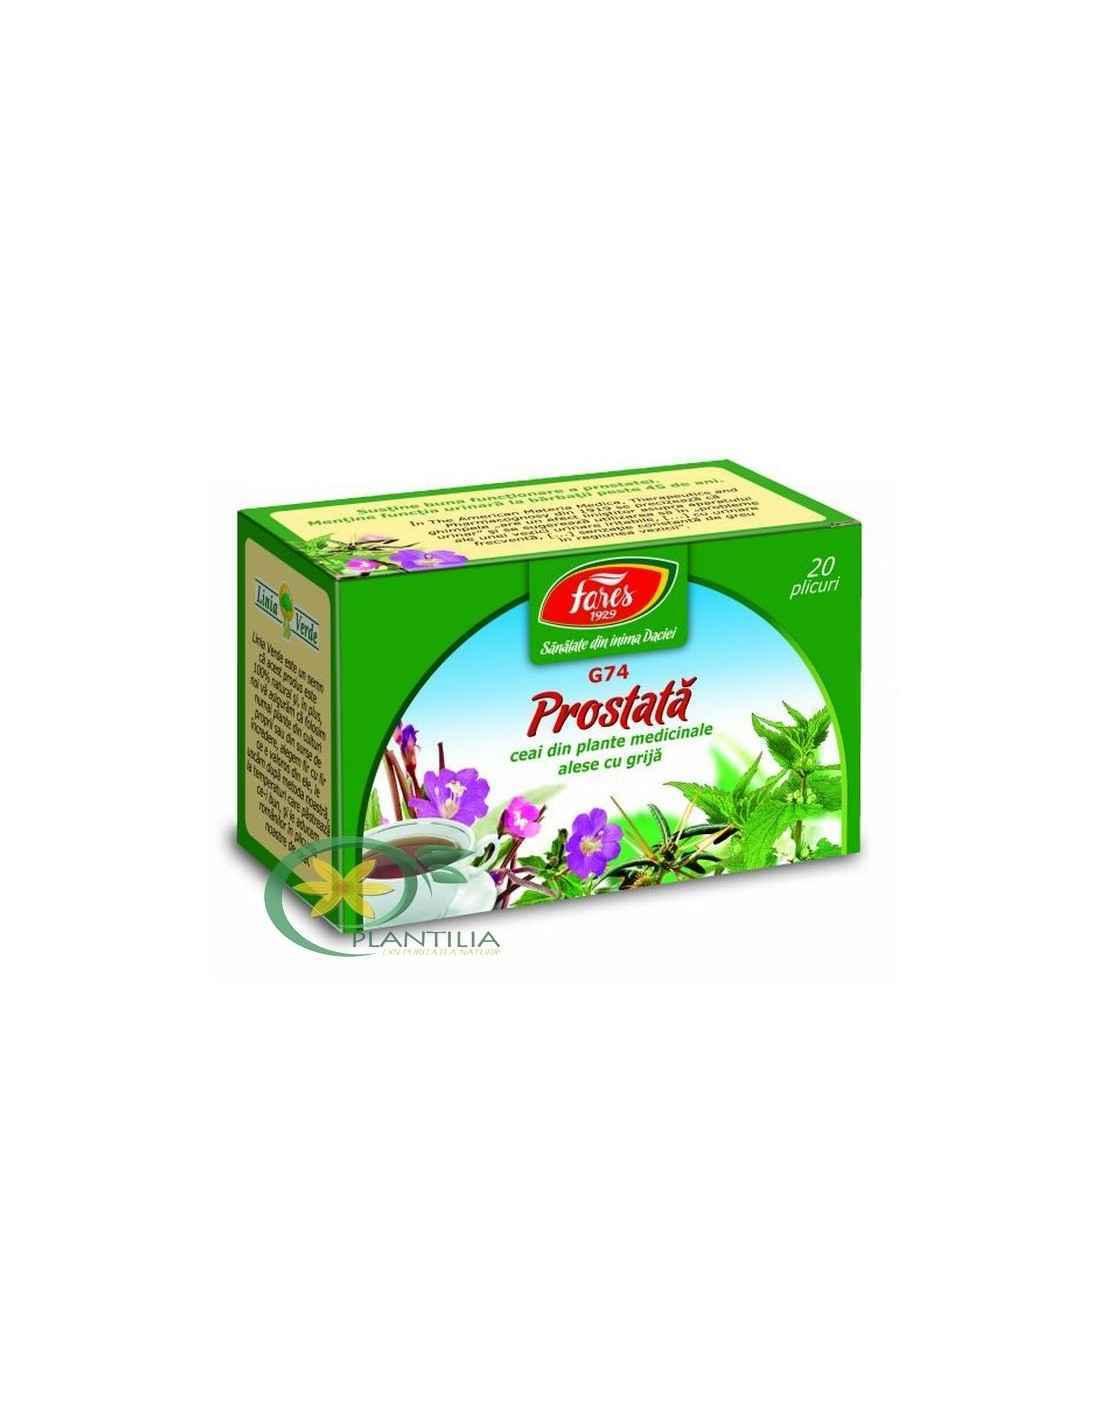 Ceaiul Prostata | prostatita.adonisfarm.ro